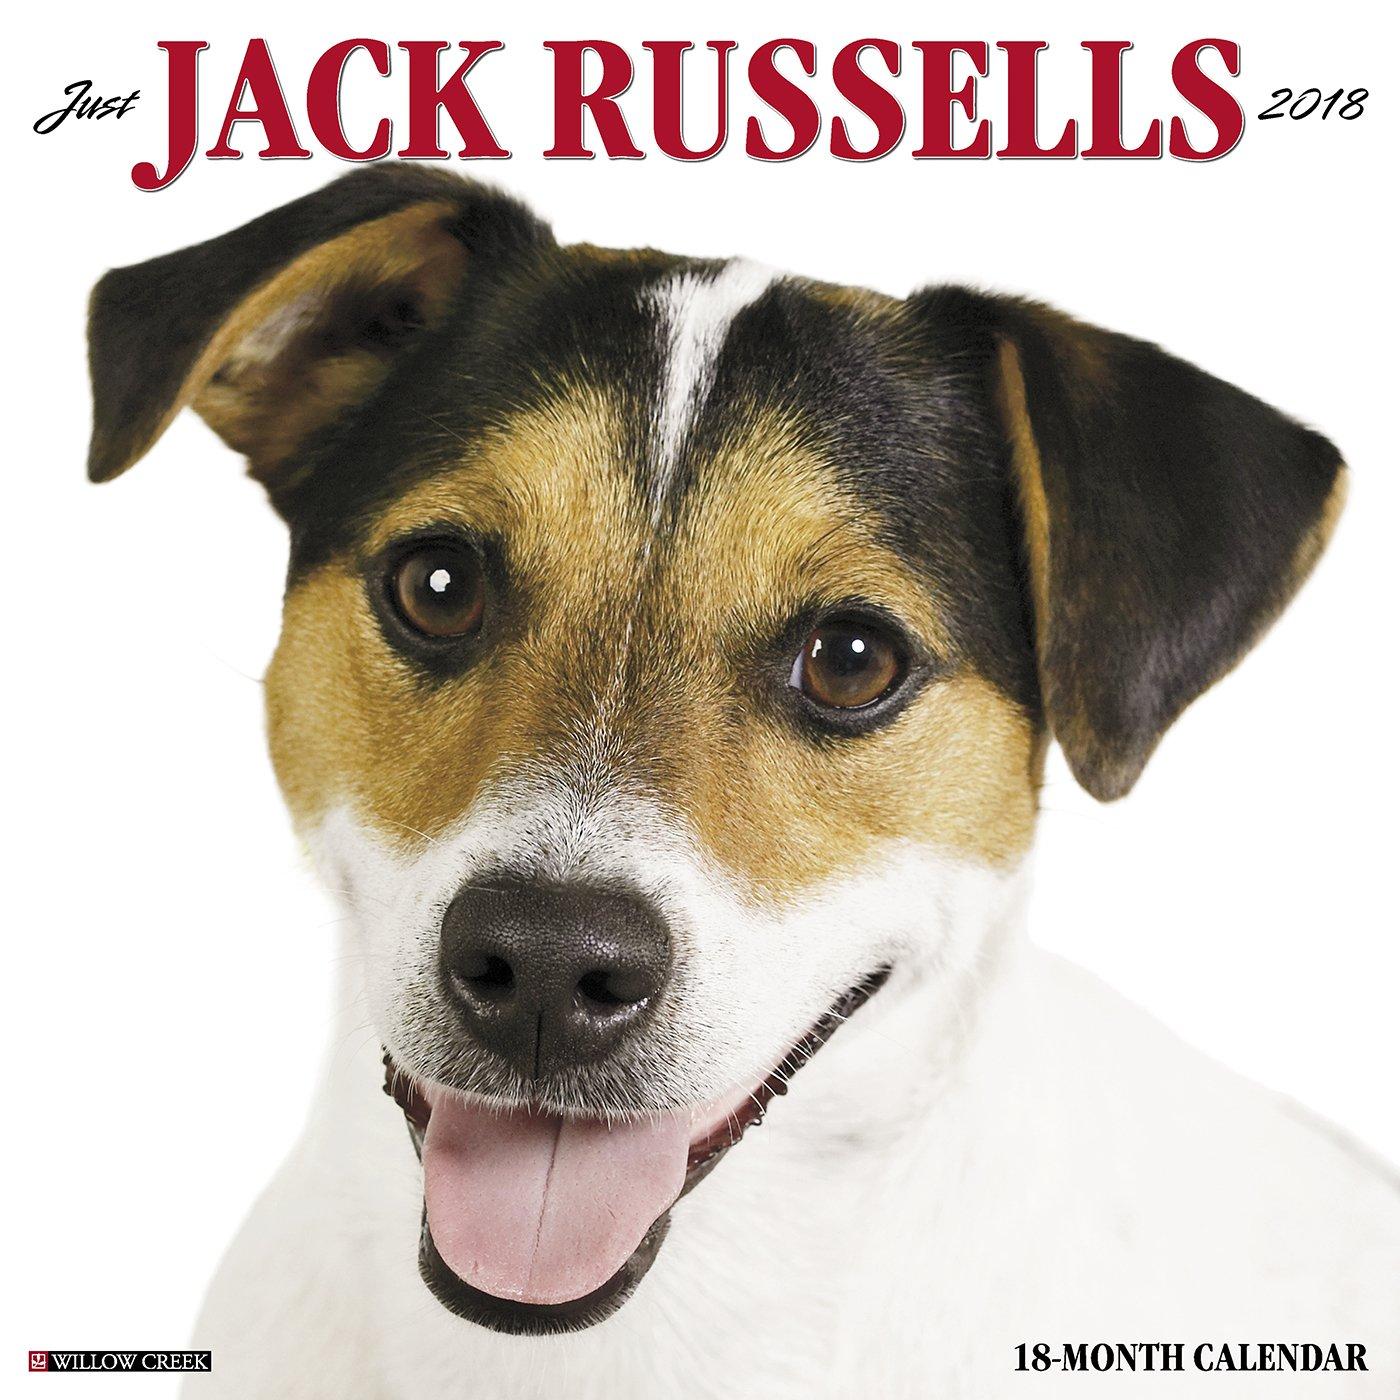 just-jack-russells-2018-calendar